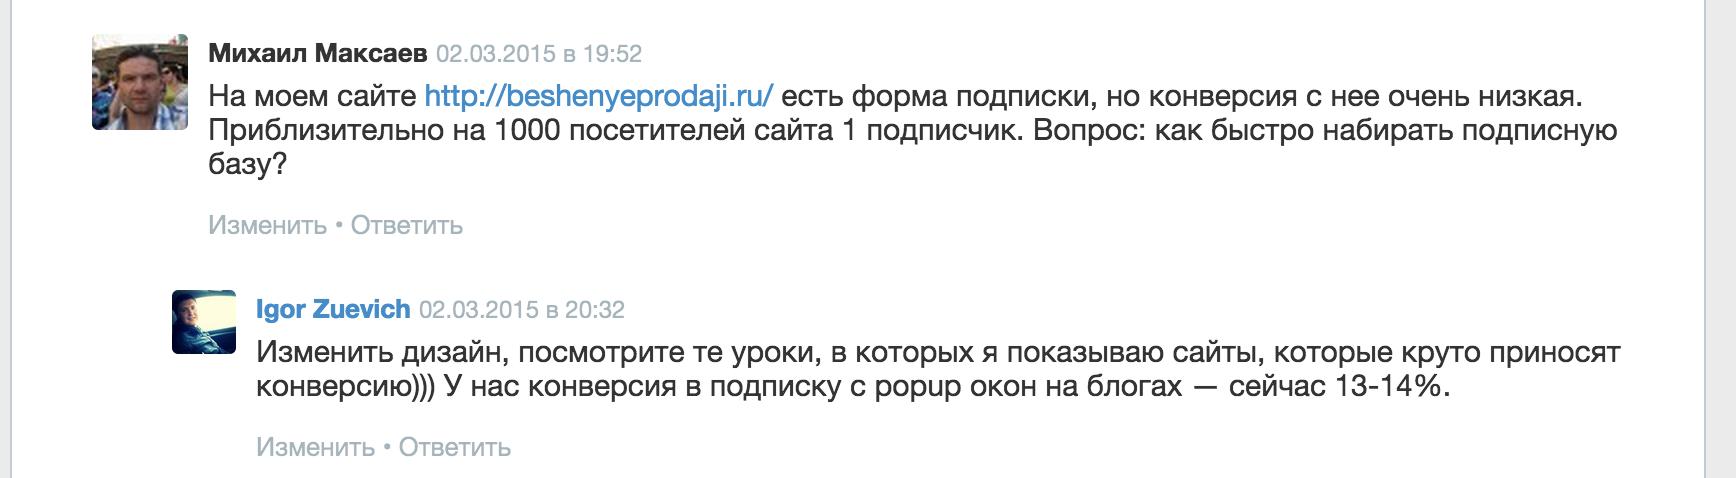 Снимок экрана 2015-03-05 в 13.06.18